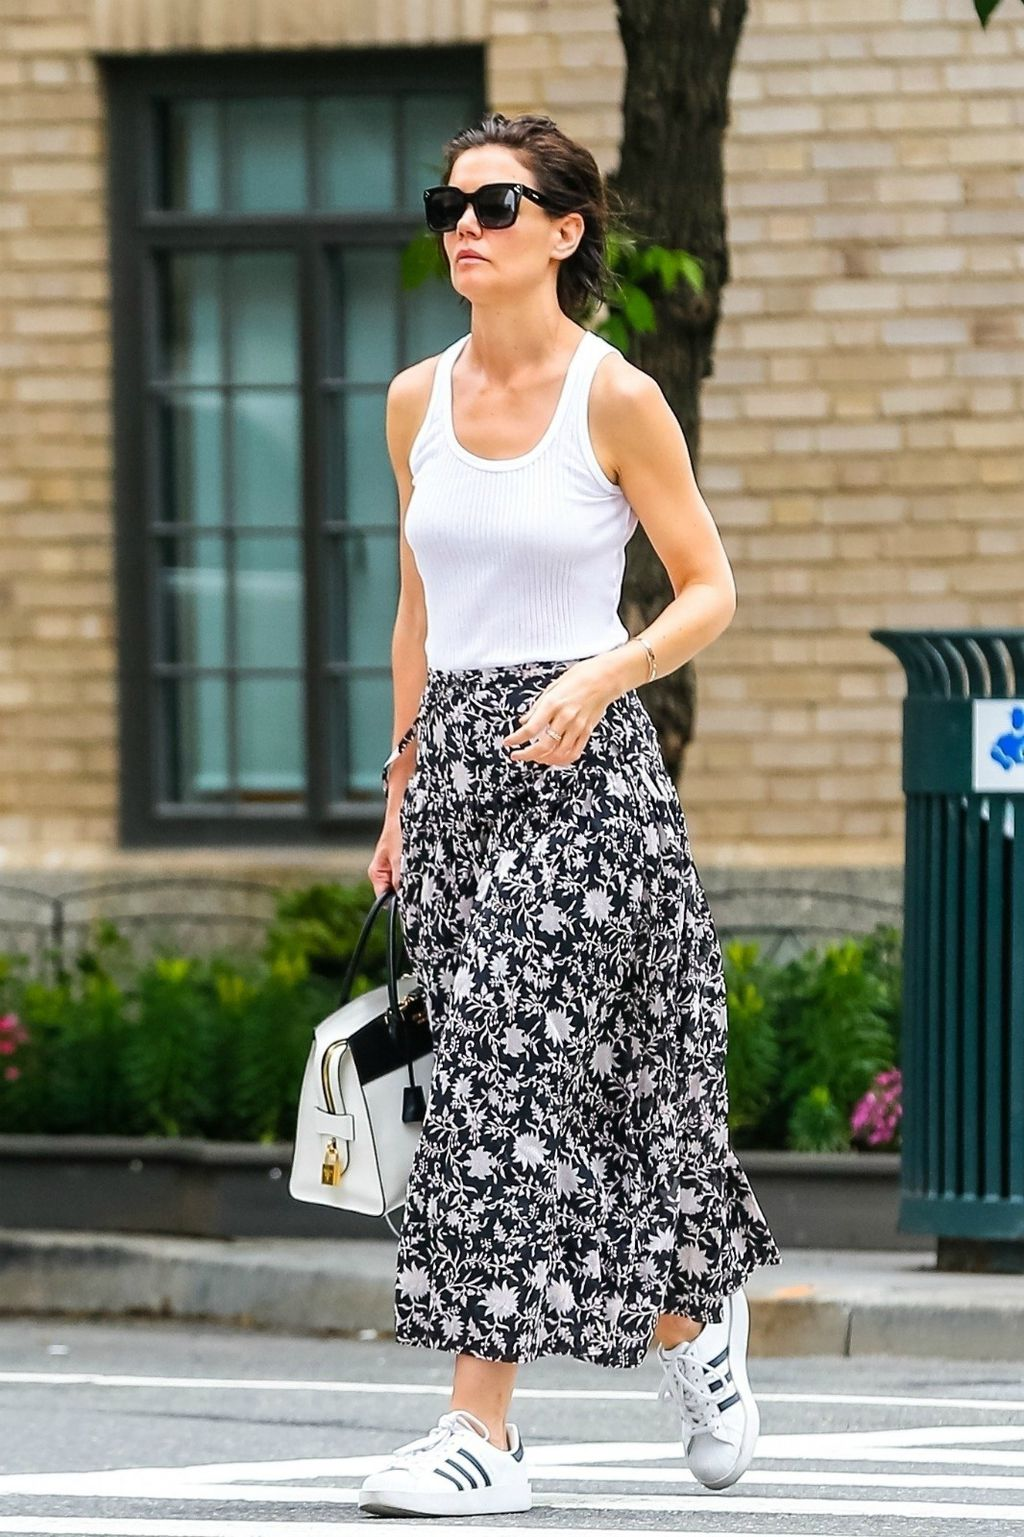 Katie nosi Adidasov model Superstar Bold